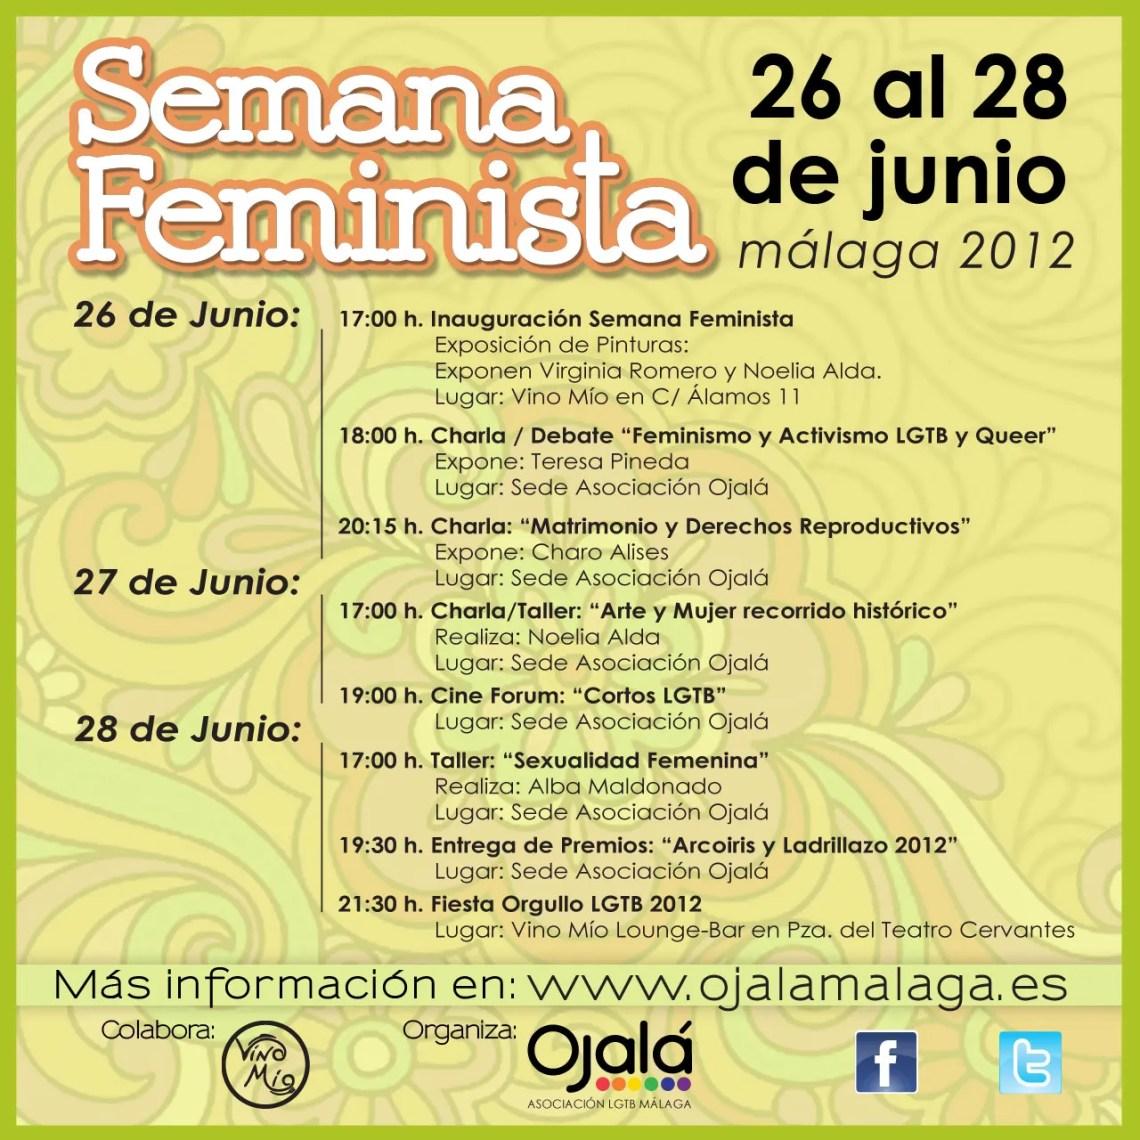 QUEDÁIS TODXS INVITADXS A NUESTRA SEMANA FEMINISTA!